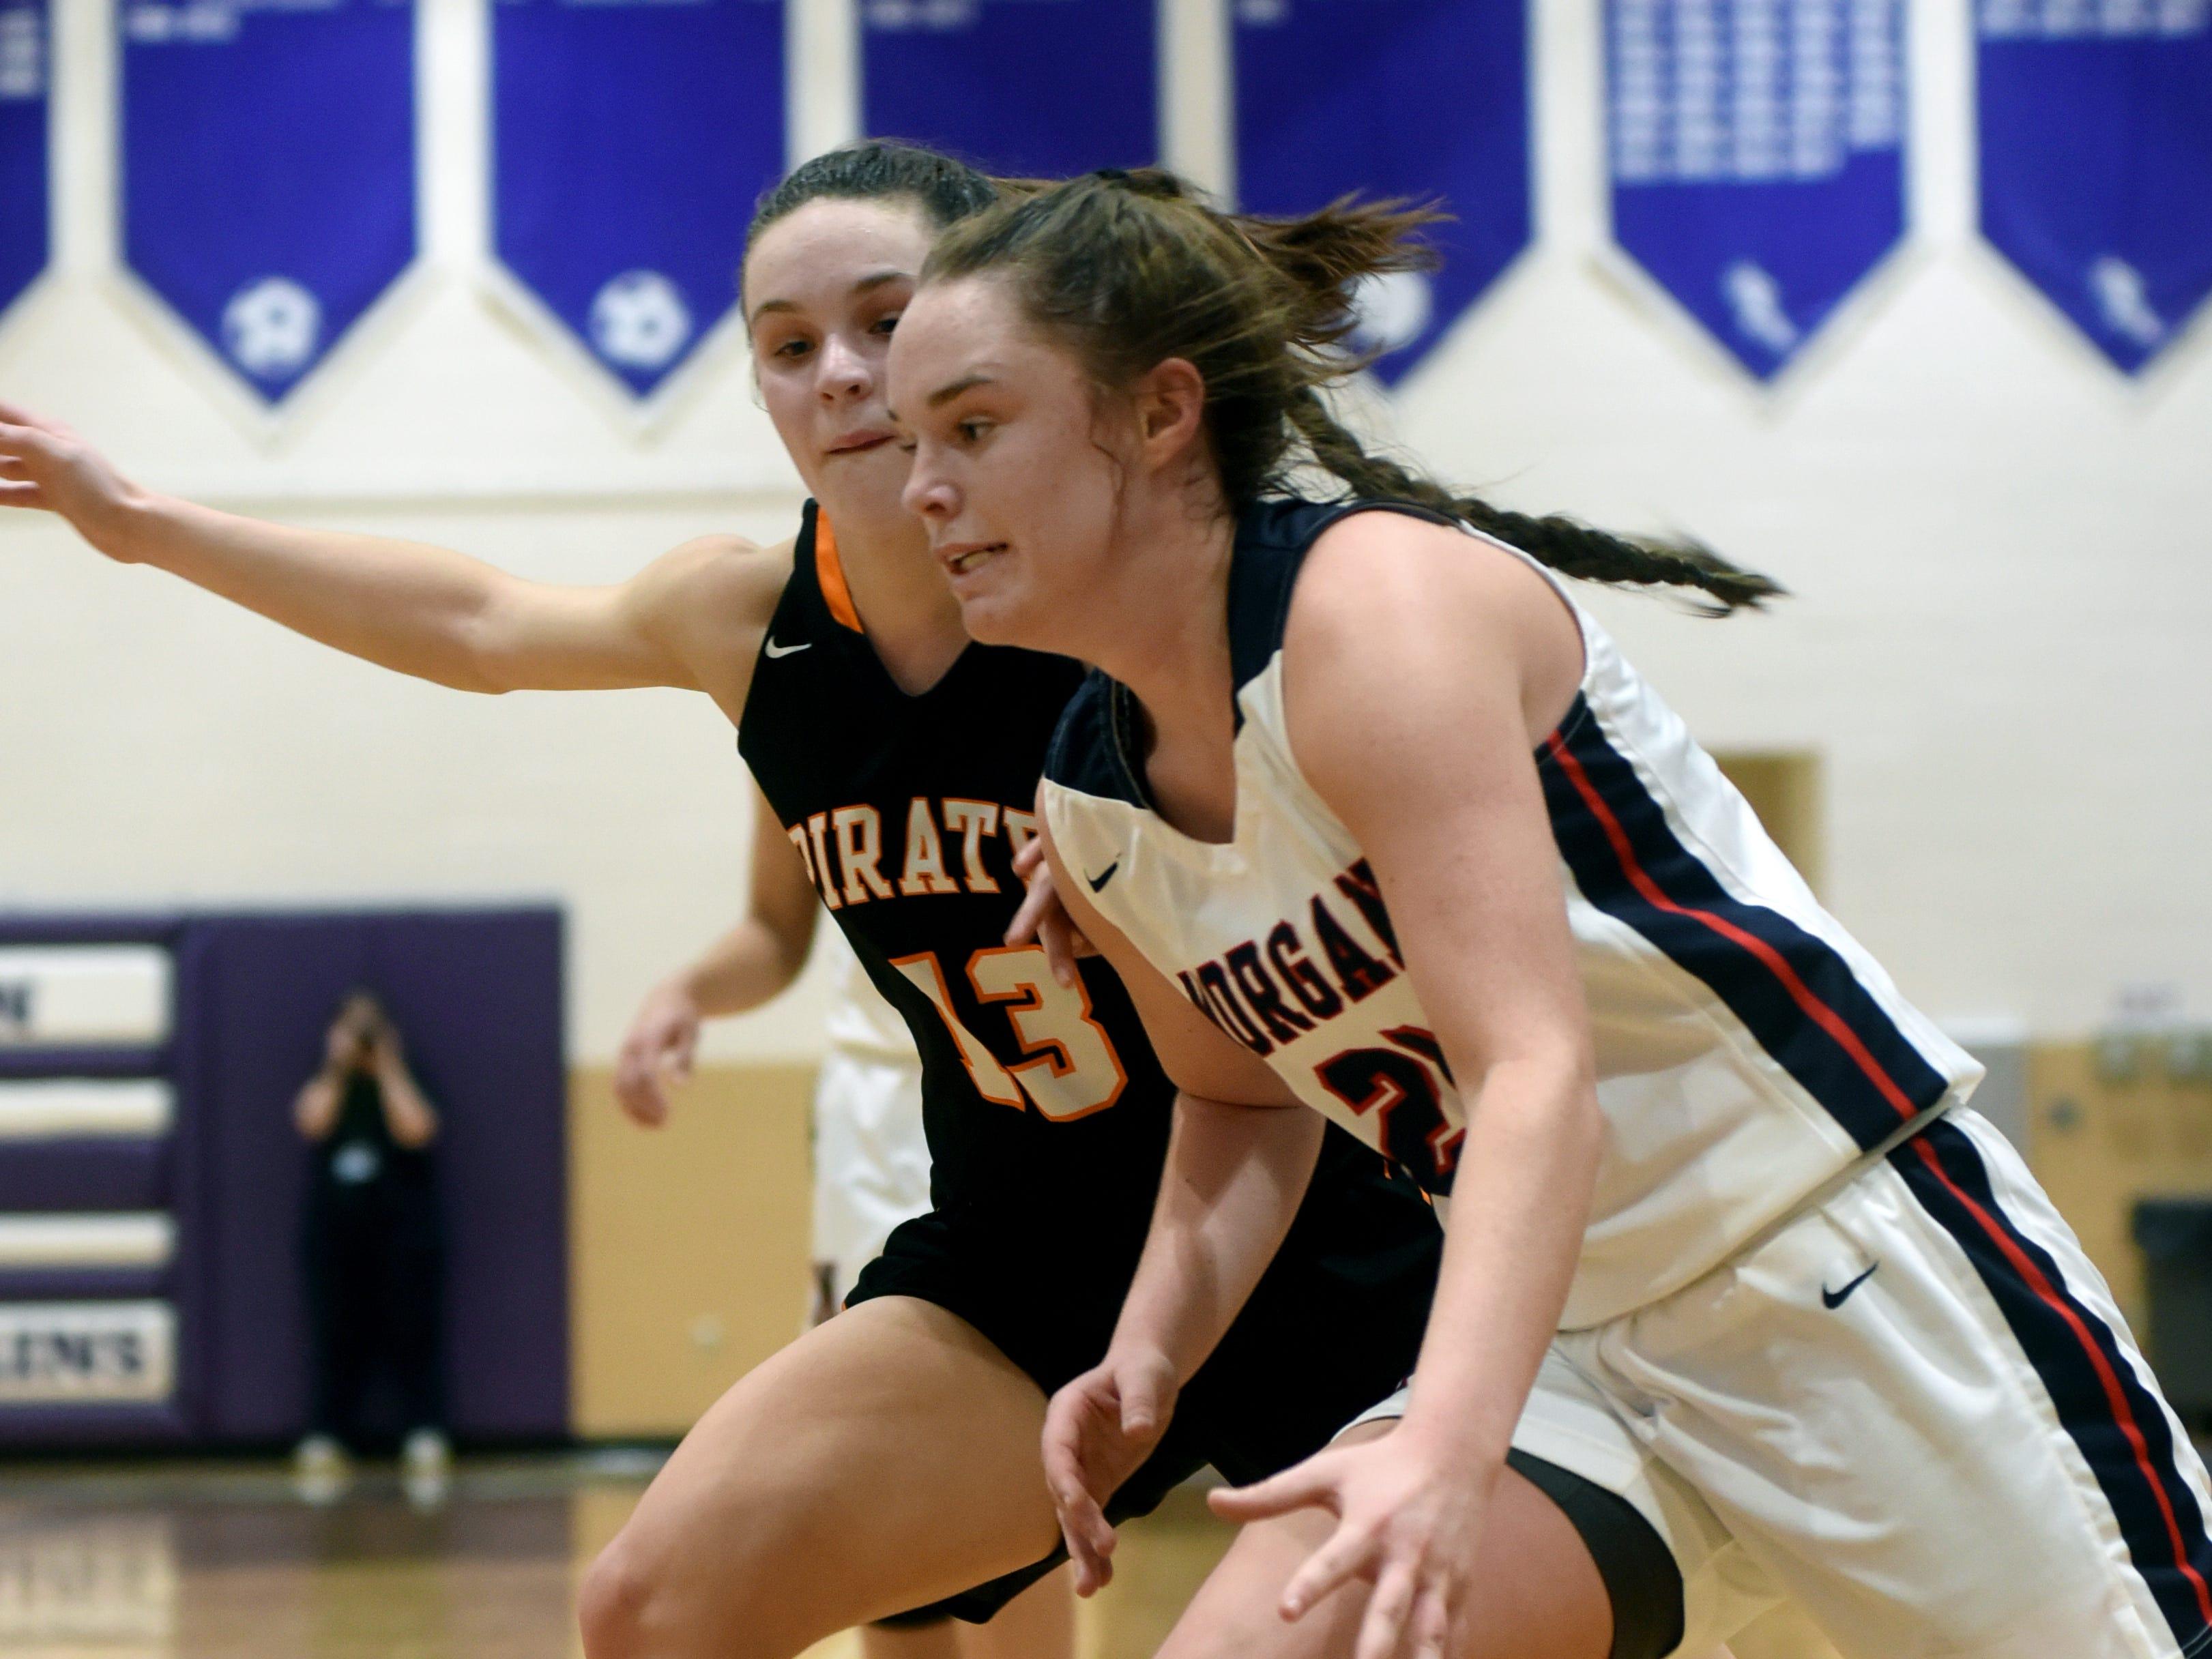 Kaylie Apperon drives the baseline against Wheelersburg's Abbie Kallner during Morgan's 56-55 loss to Wheelersburg in a Division III regional semifinal at Logan.